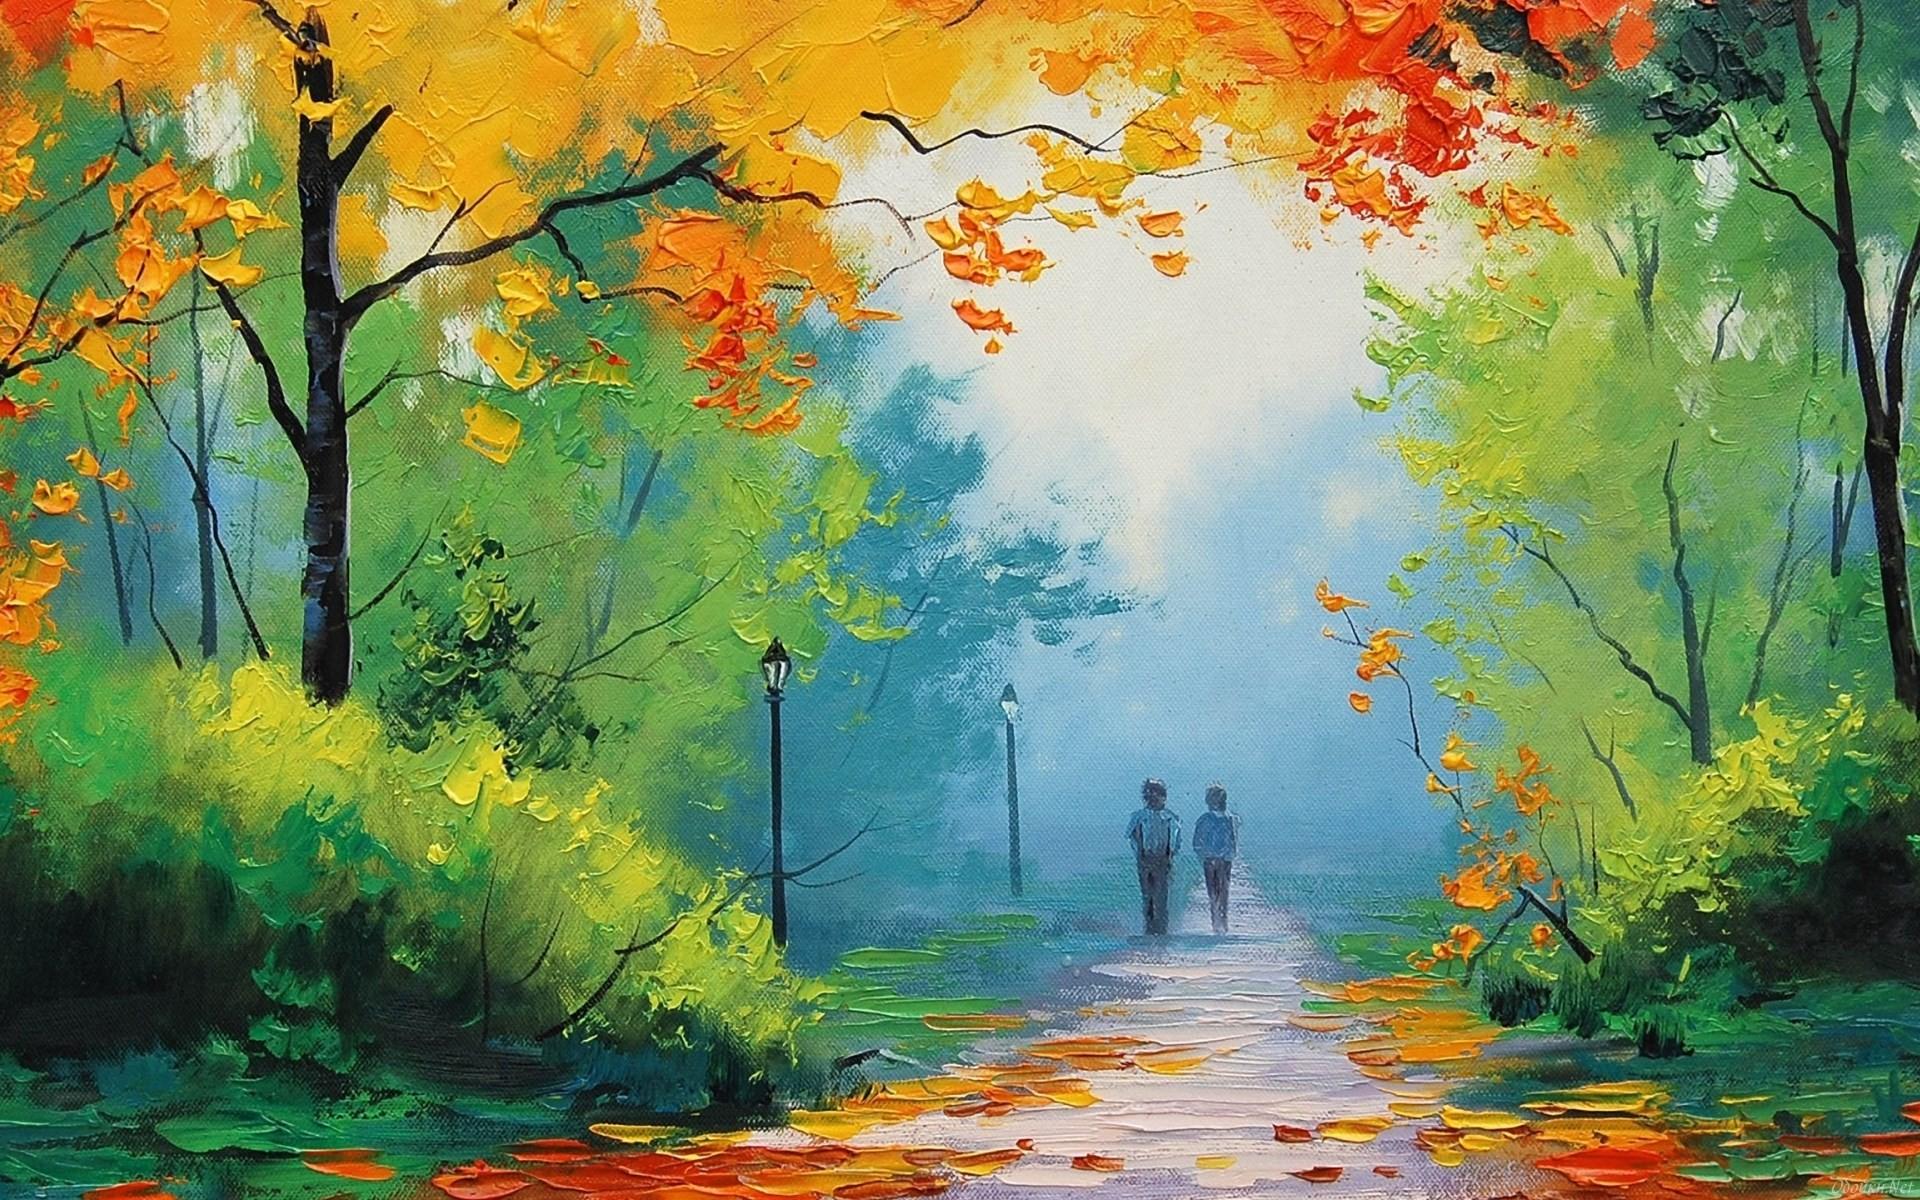 General 1920x1200 painting fall park Graham Gercken path artwork trees lantern